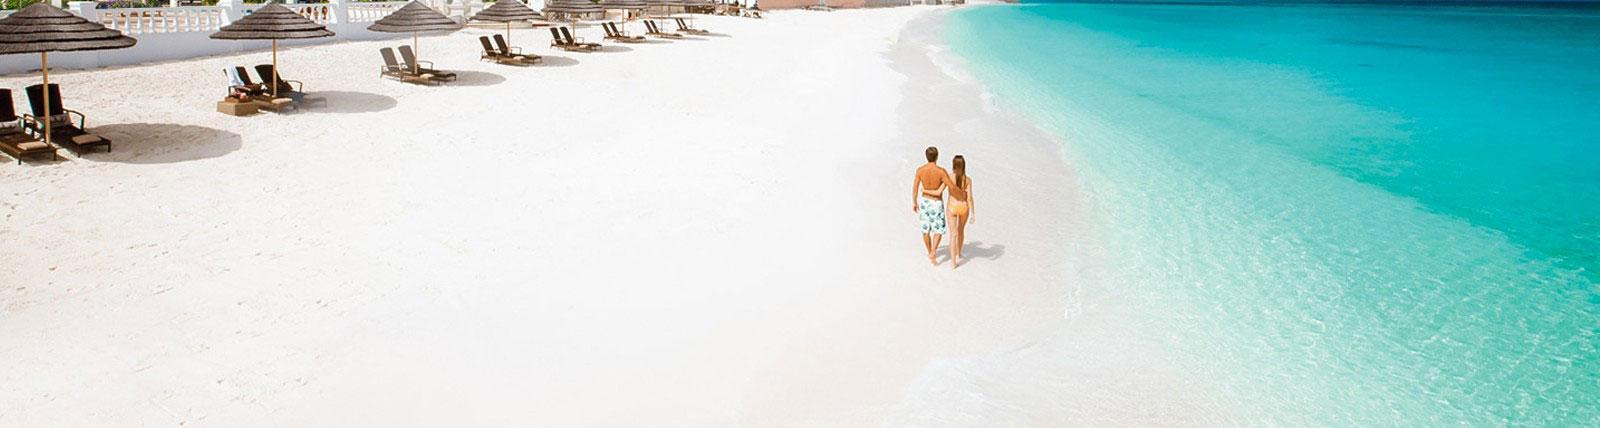 f06869032 header-Sandals-Royal-Bahamian-Luxury-Caribbean-Holidays-1600x700 ...